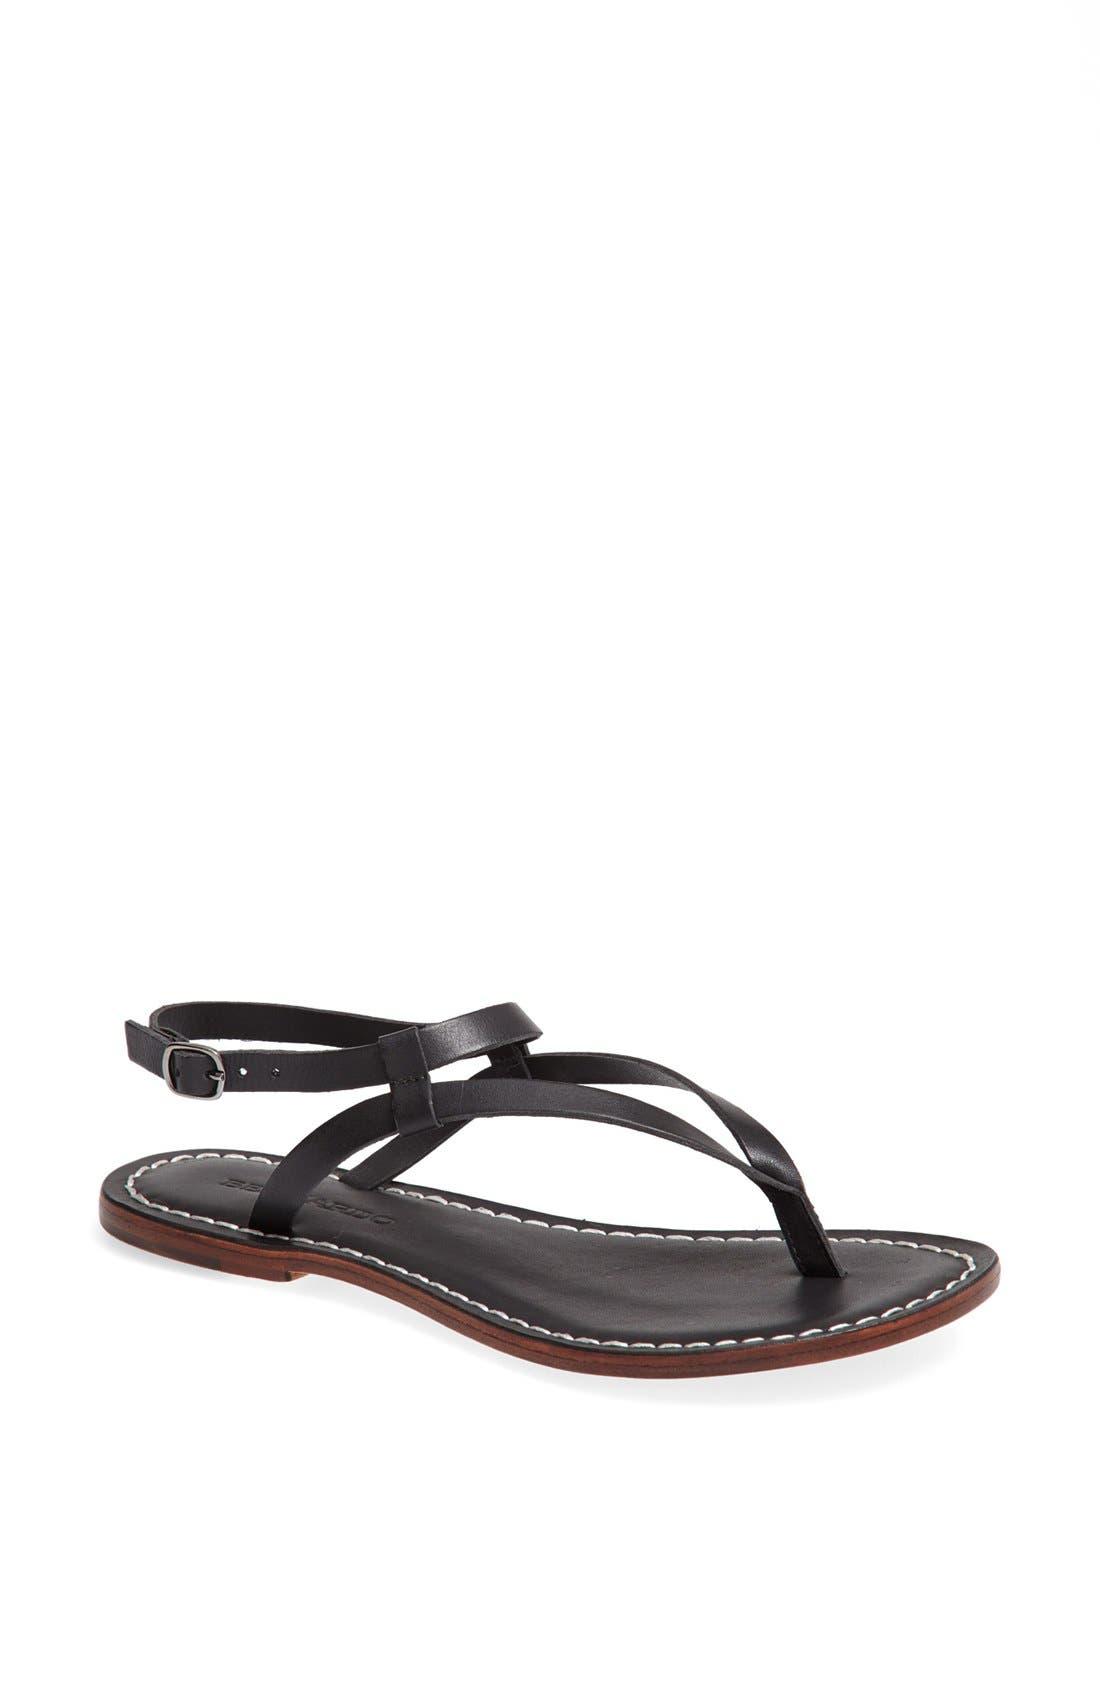 Alternate Image 1 Selected - Bernardo Footwear Merit Thong Sandal